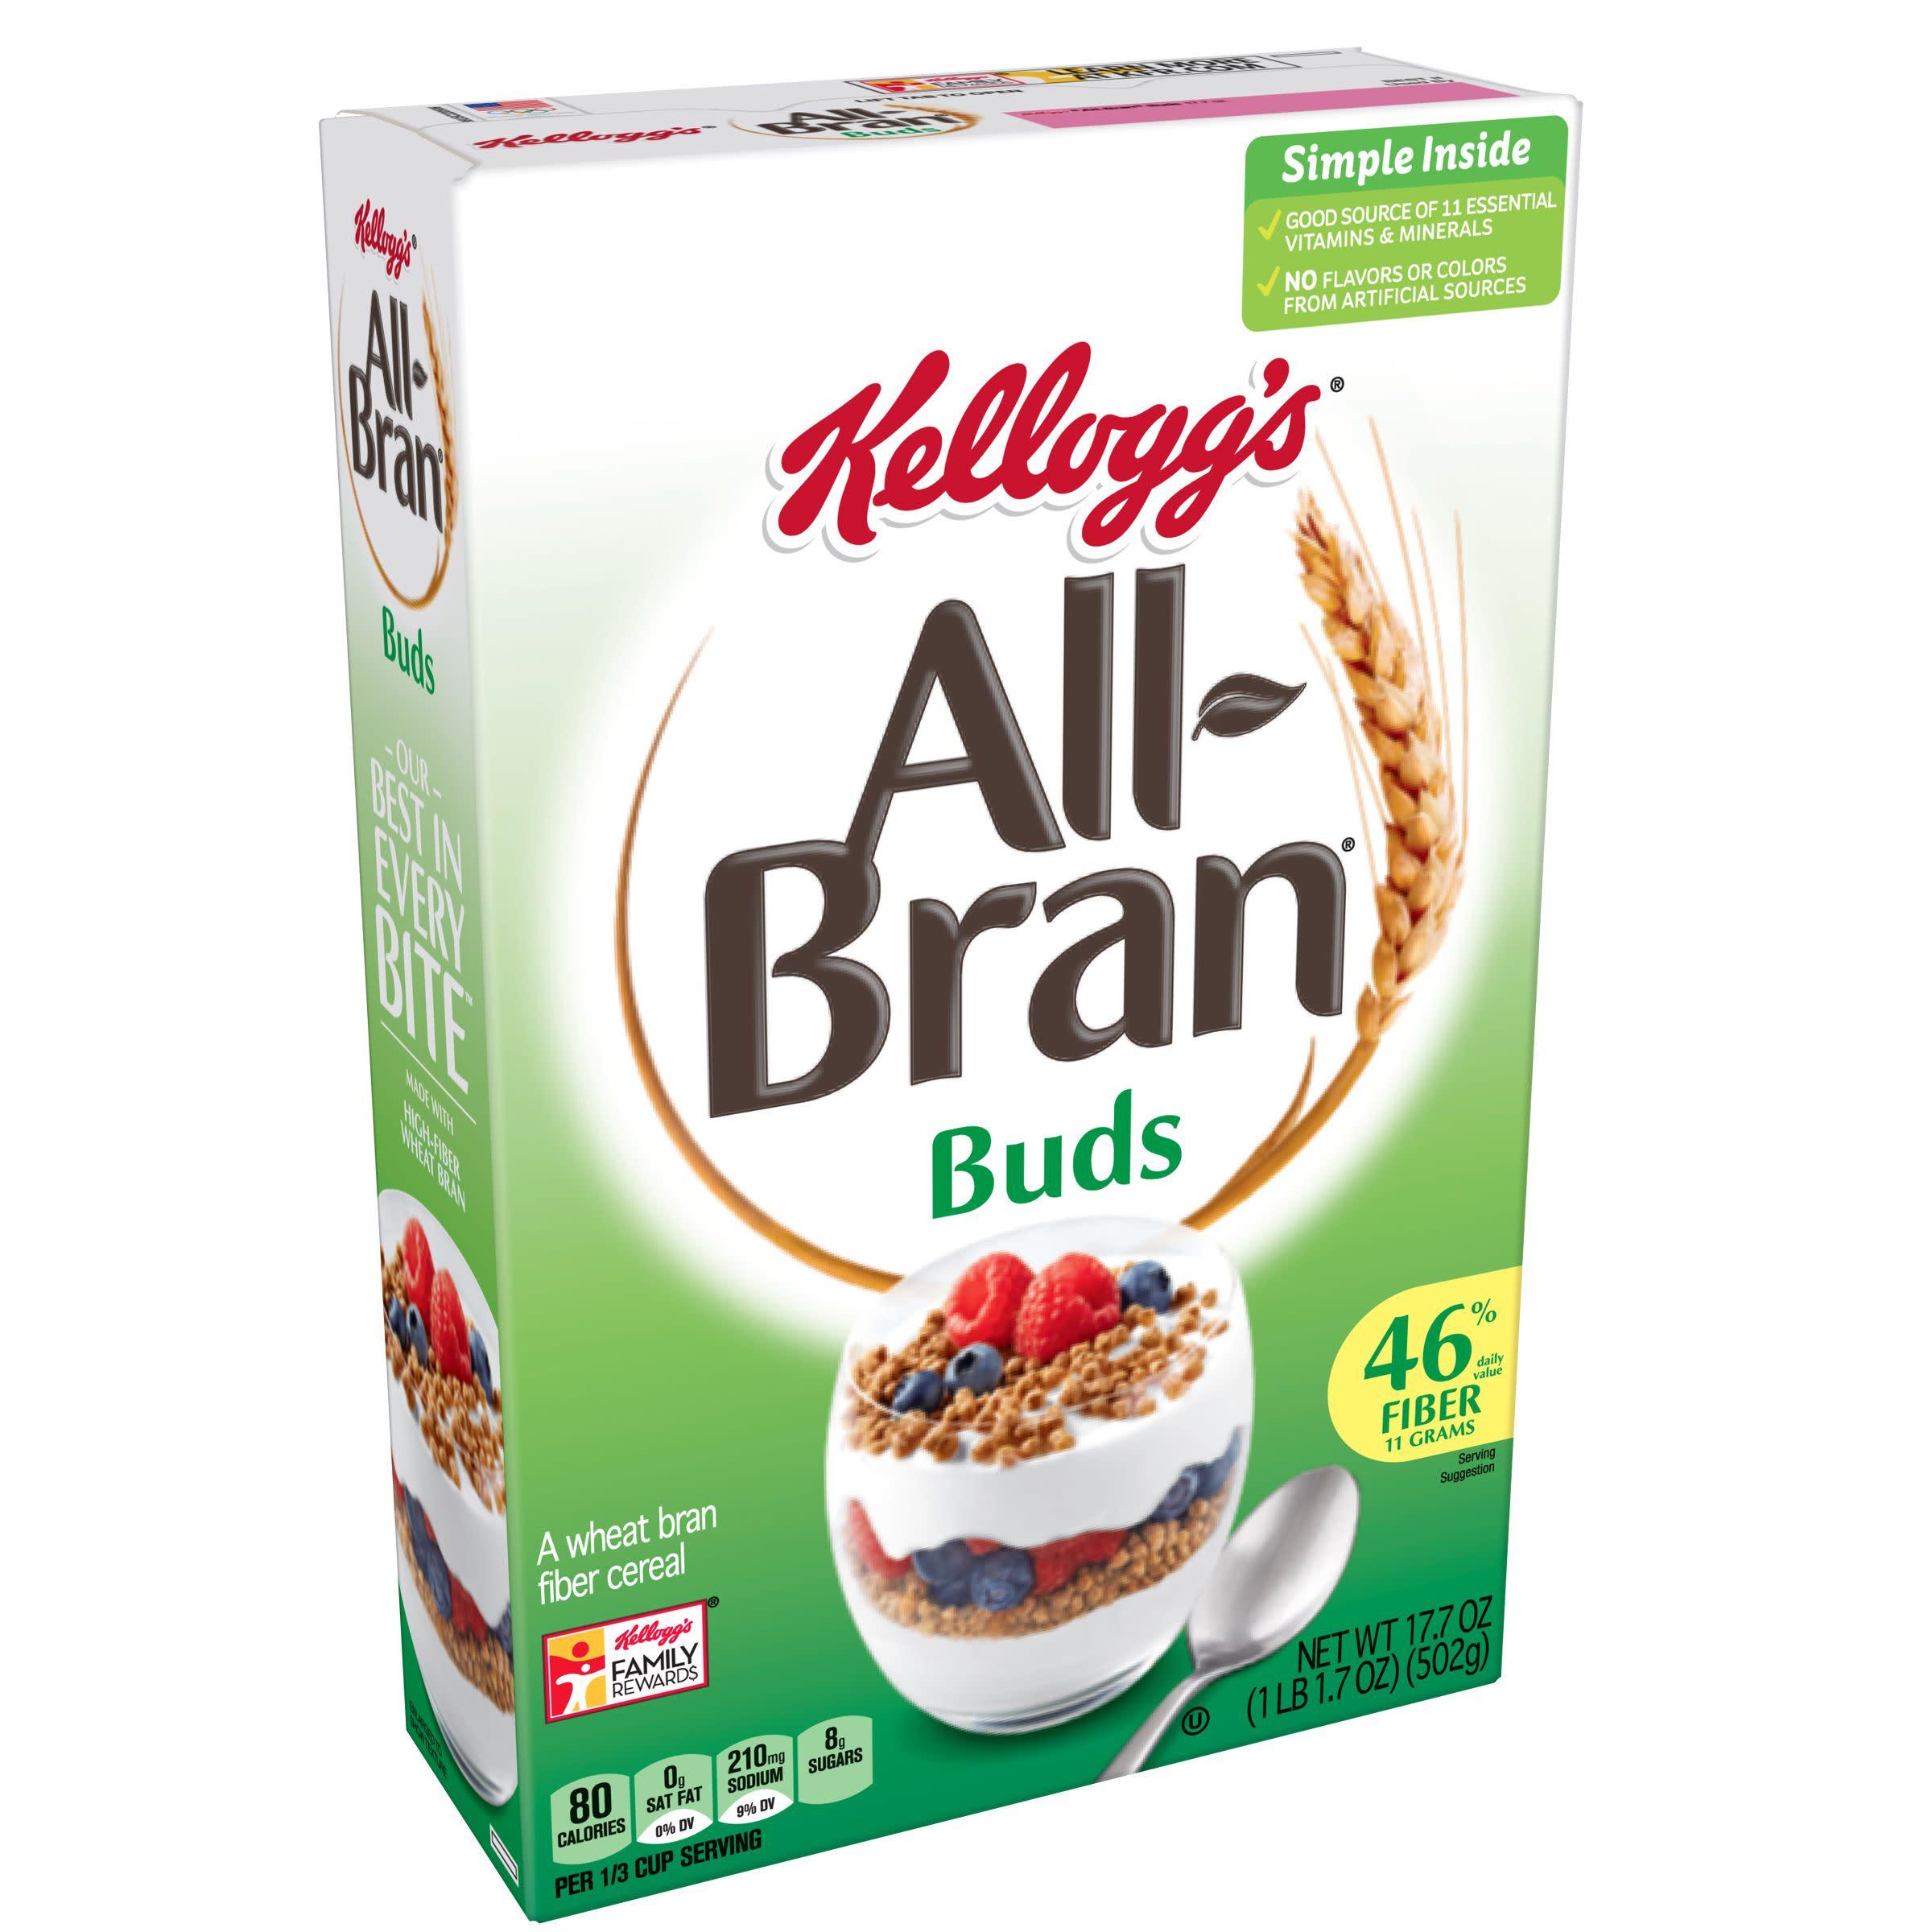 Kellogg's All-Bran Buds, Breakfast Cereal, Wheat Bran, 17.7 oz